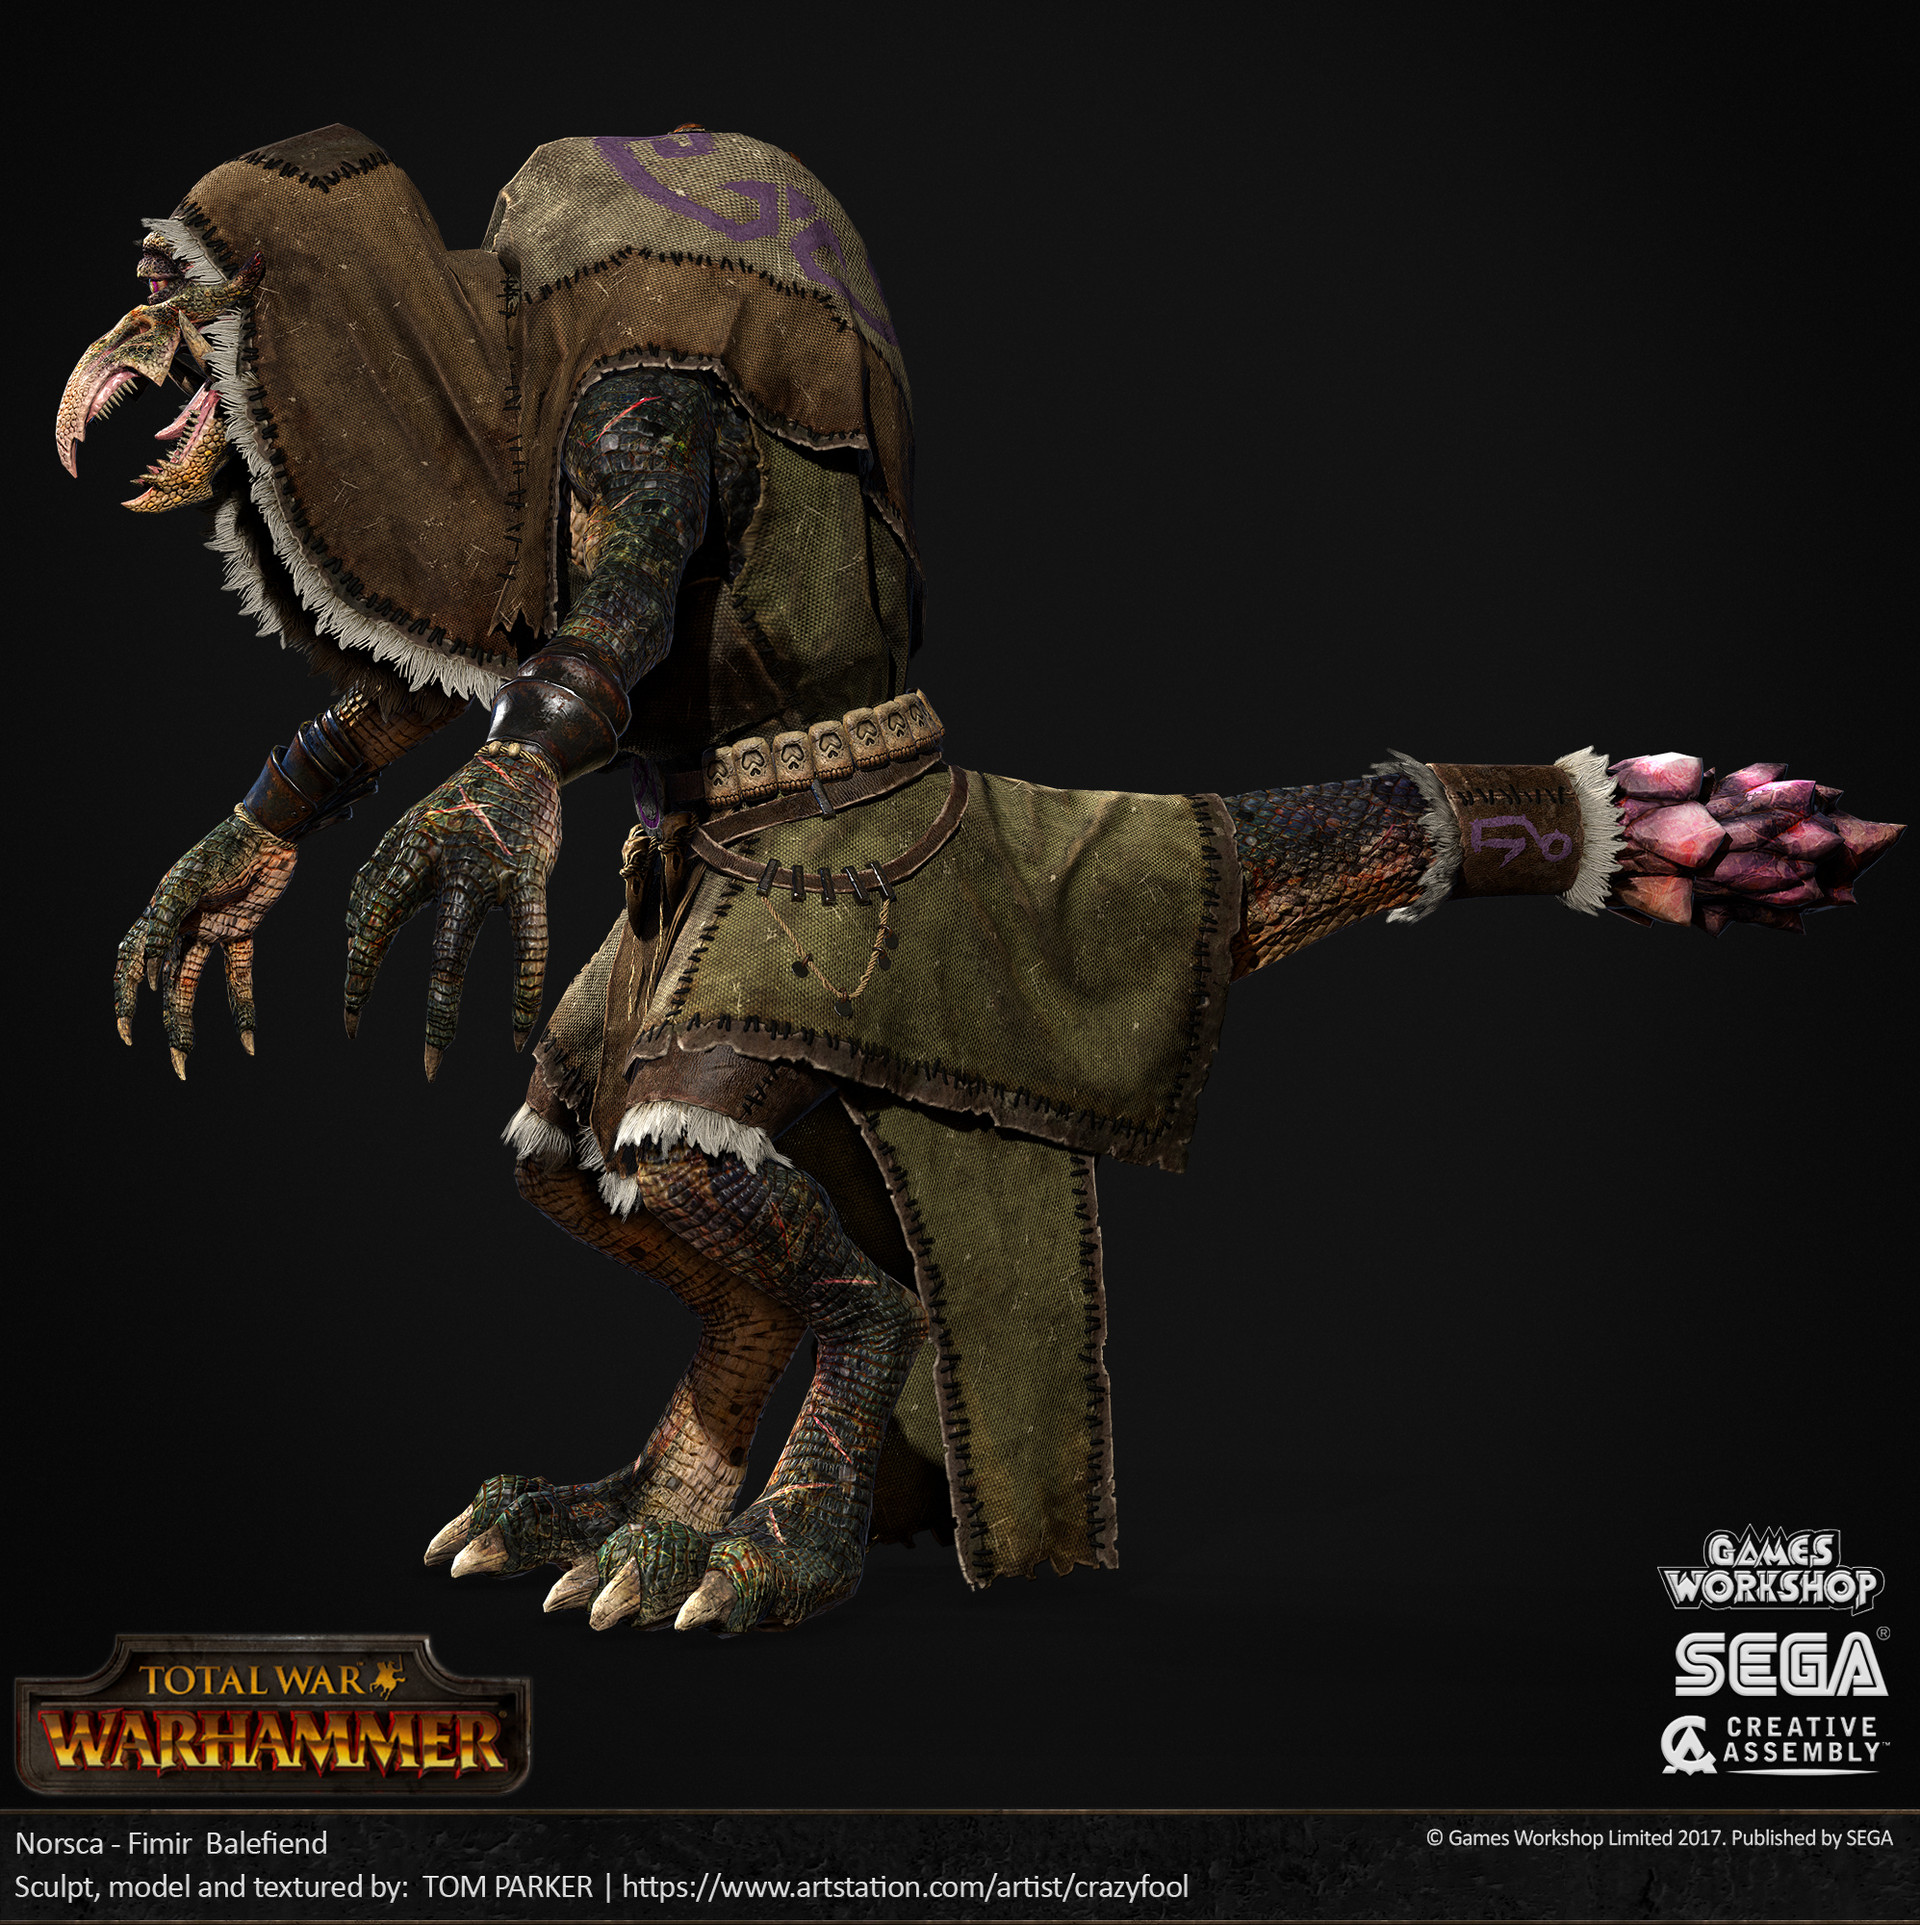 Total War : Warhammer - Page 5 Tom-parker-tomp-nor-fimir-balefiend-lp-12